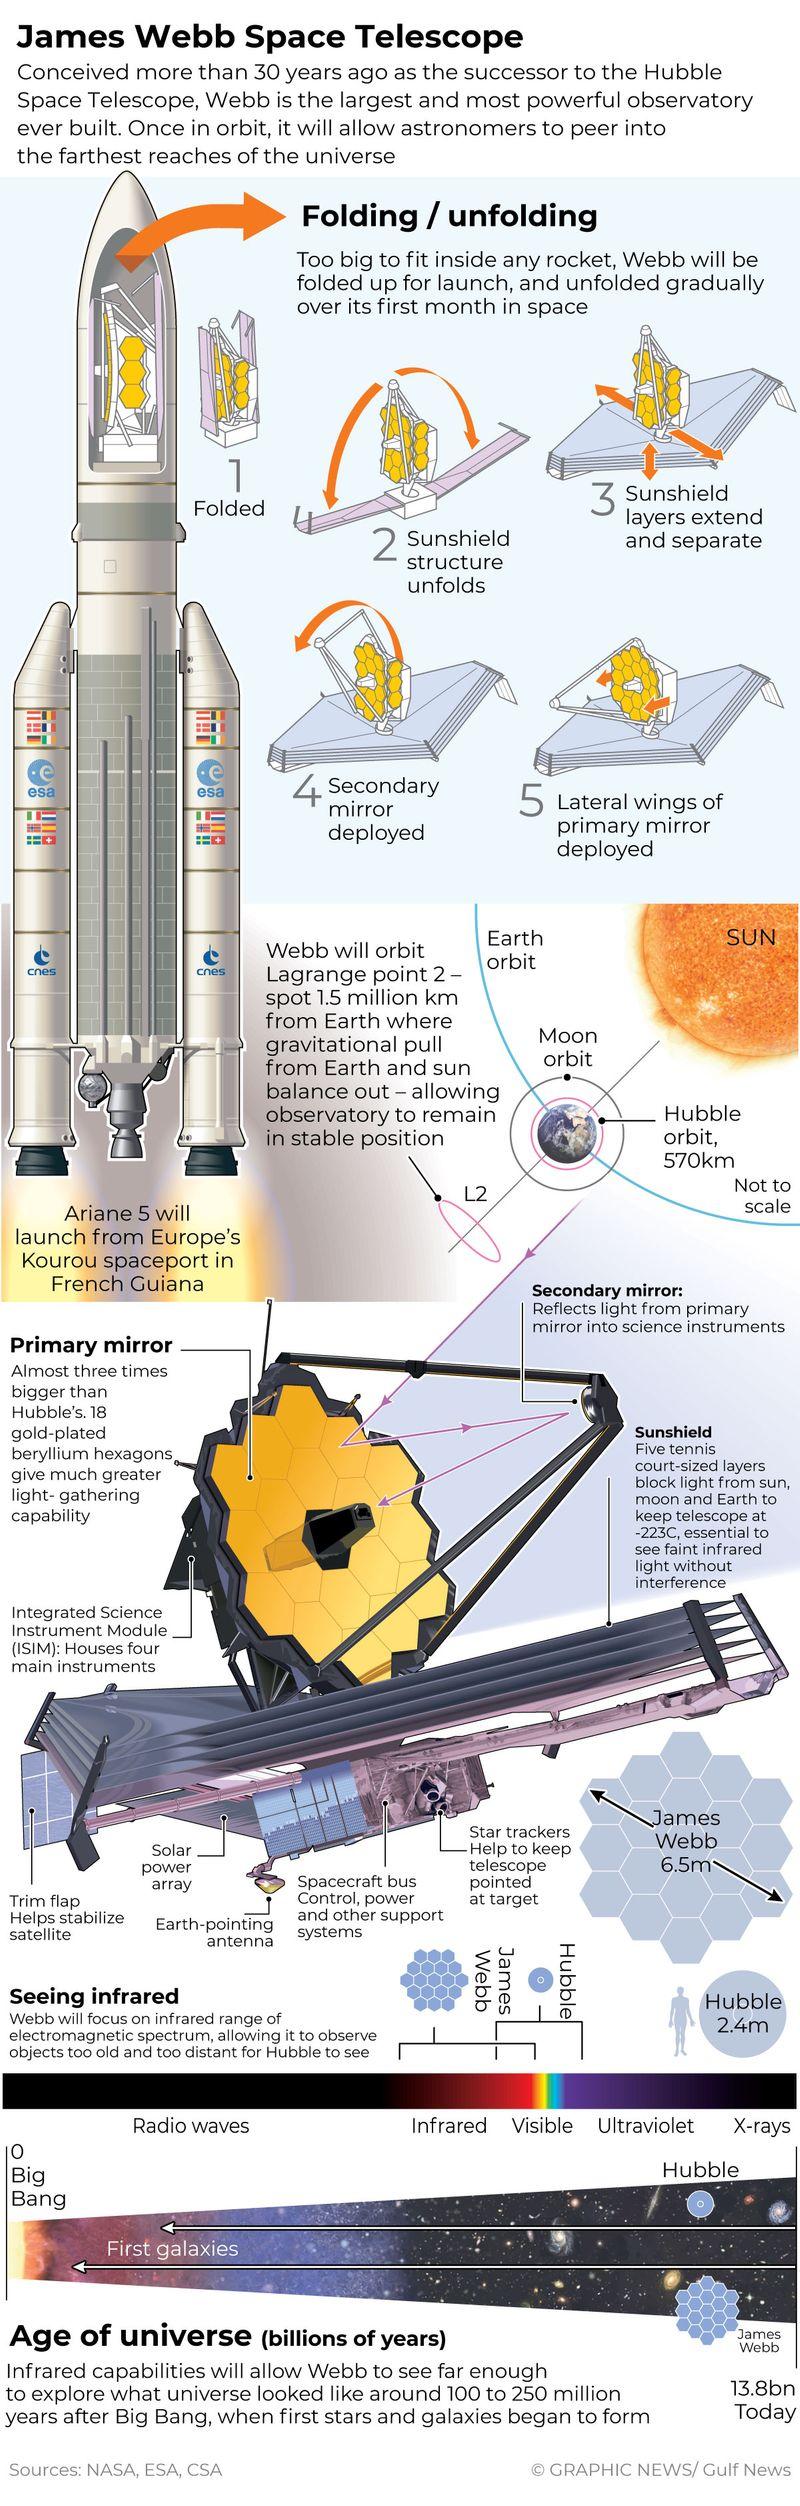 James Webb super-telescope set to launch